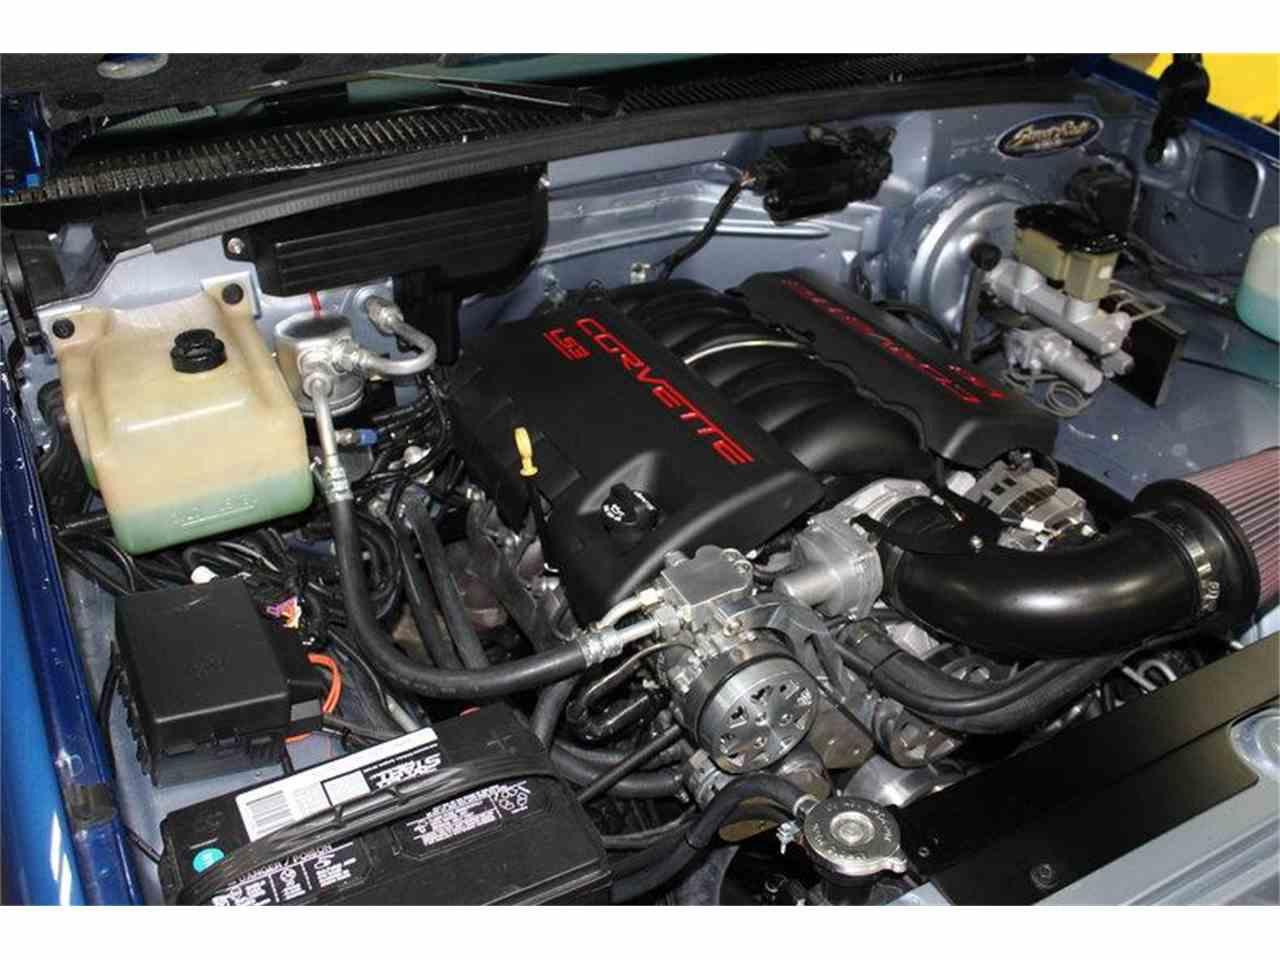 Large Picture of '89 Chevrolet C/K 1500 located in Arizona - $34,995.00 - LVUA